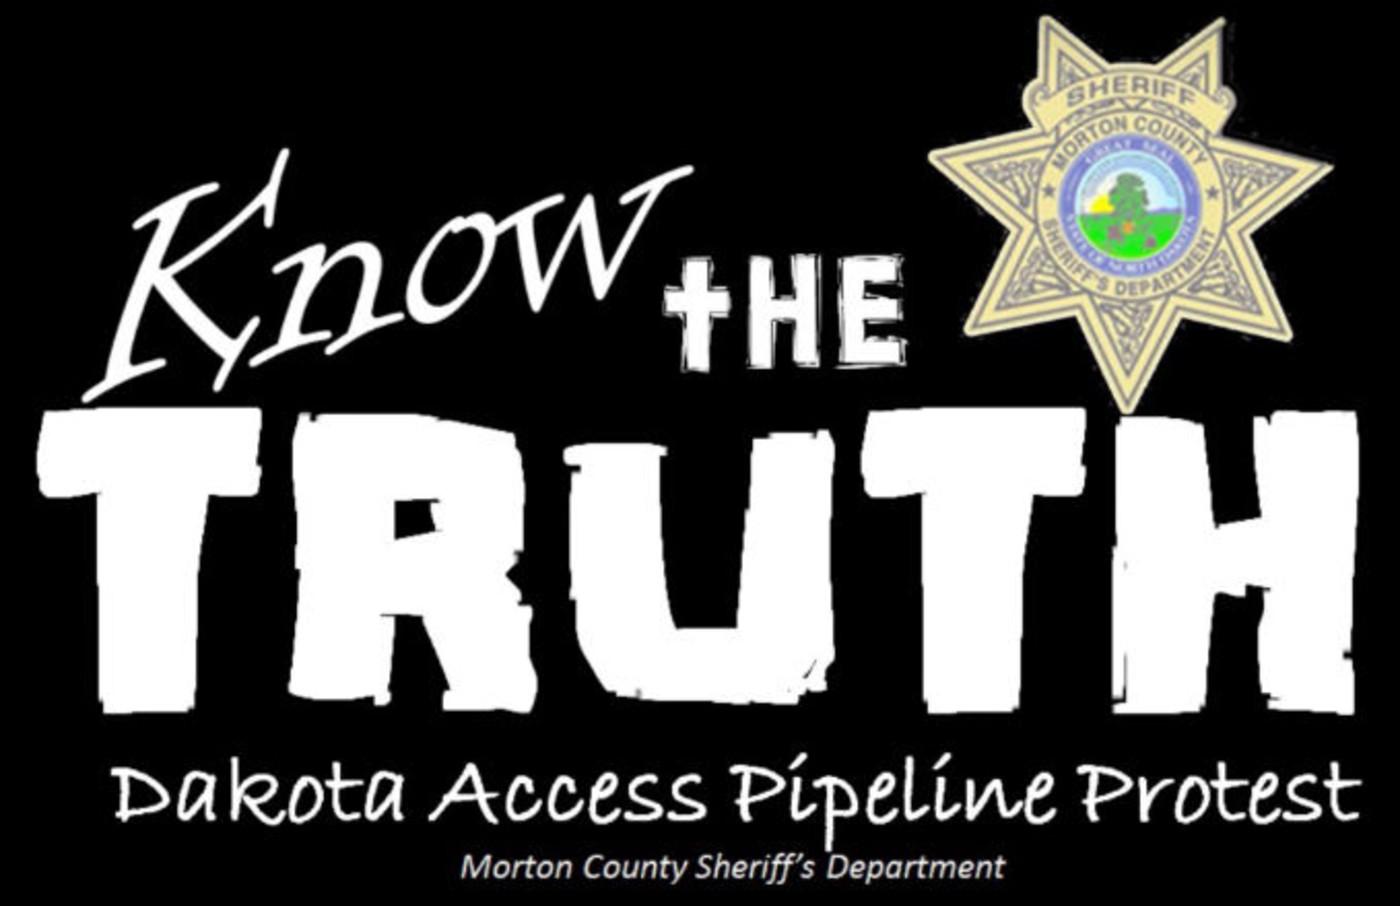 Morton County Sheriff's Department video